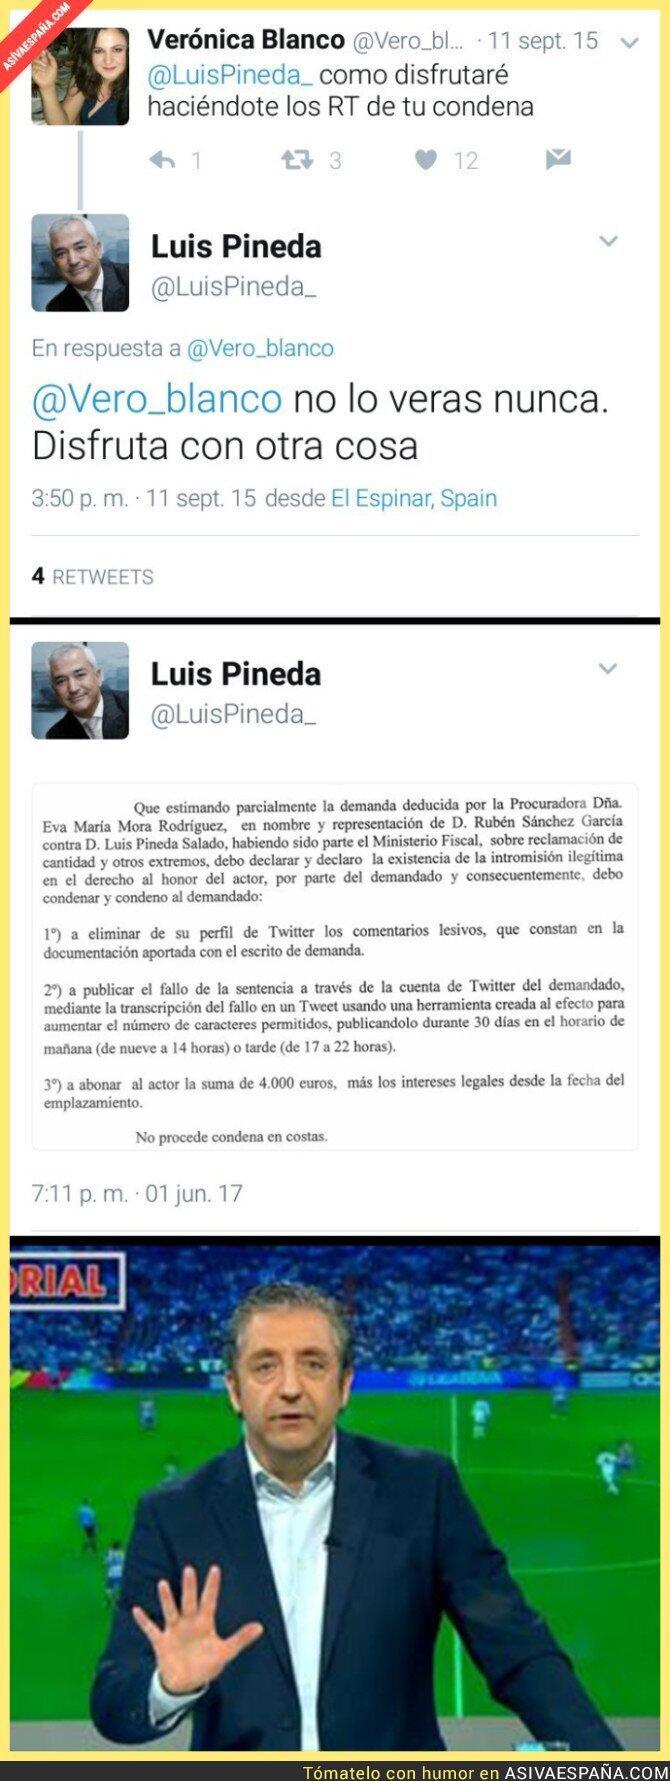 69050 - Luis Pineda (Ausbanc) ha quedado retratadísimo